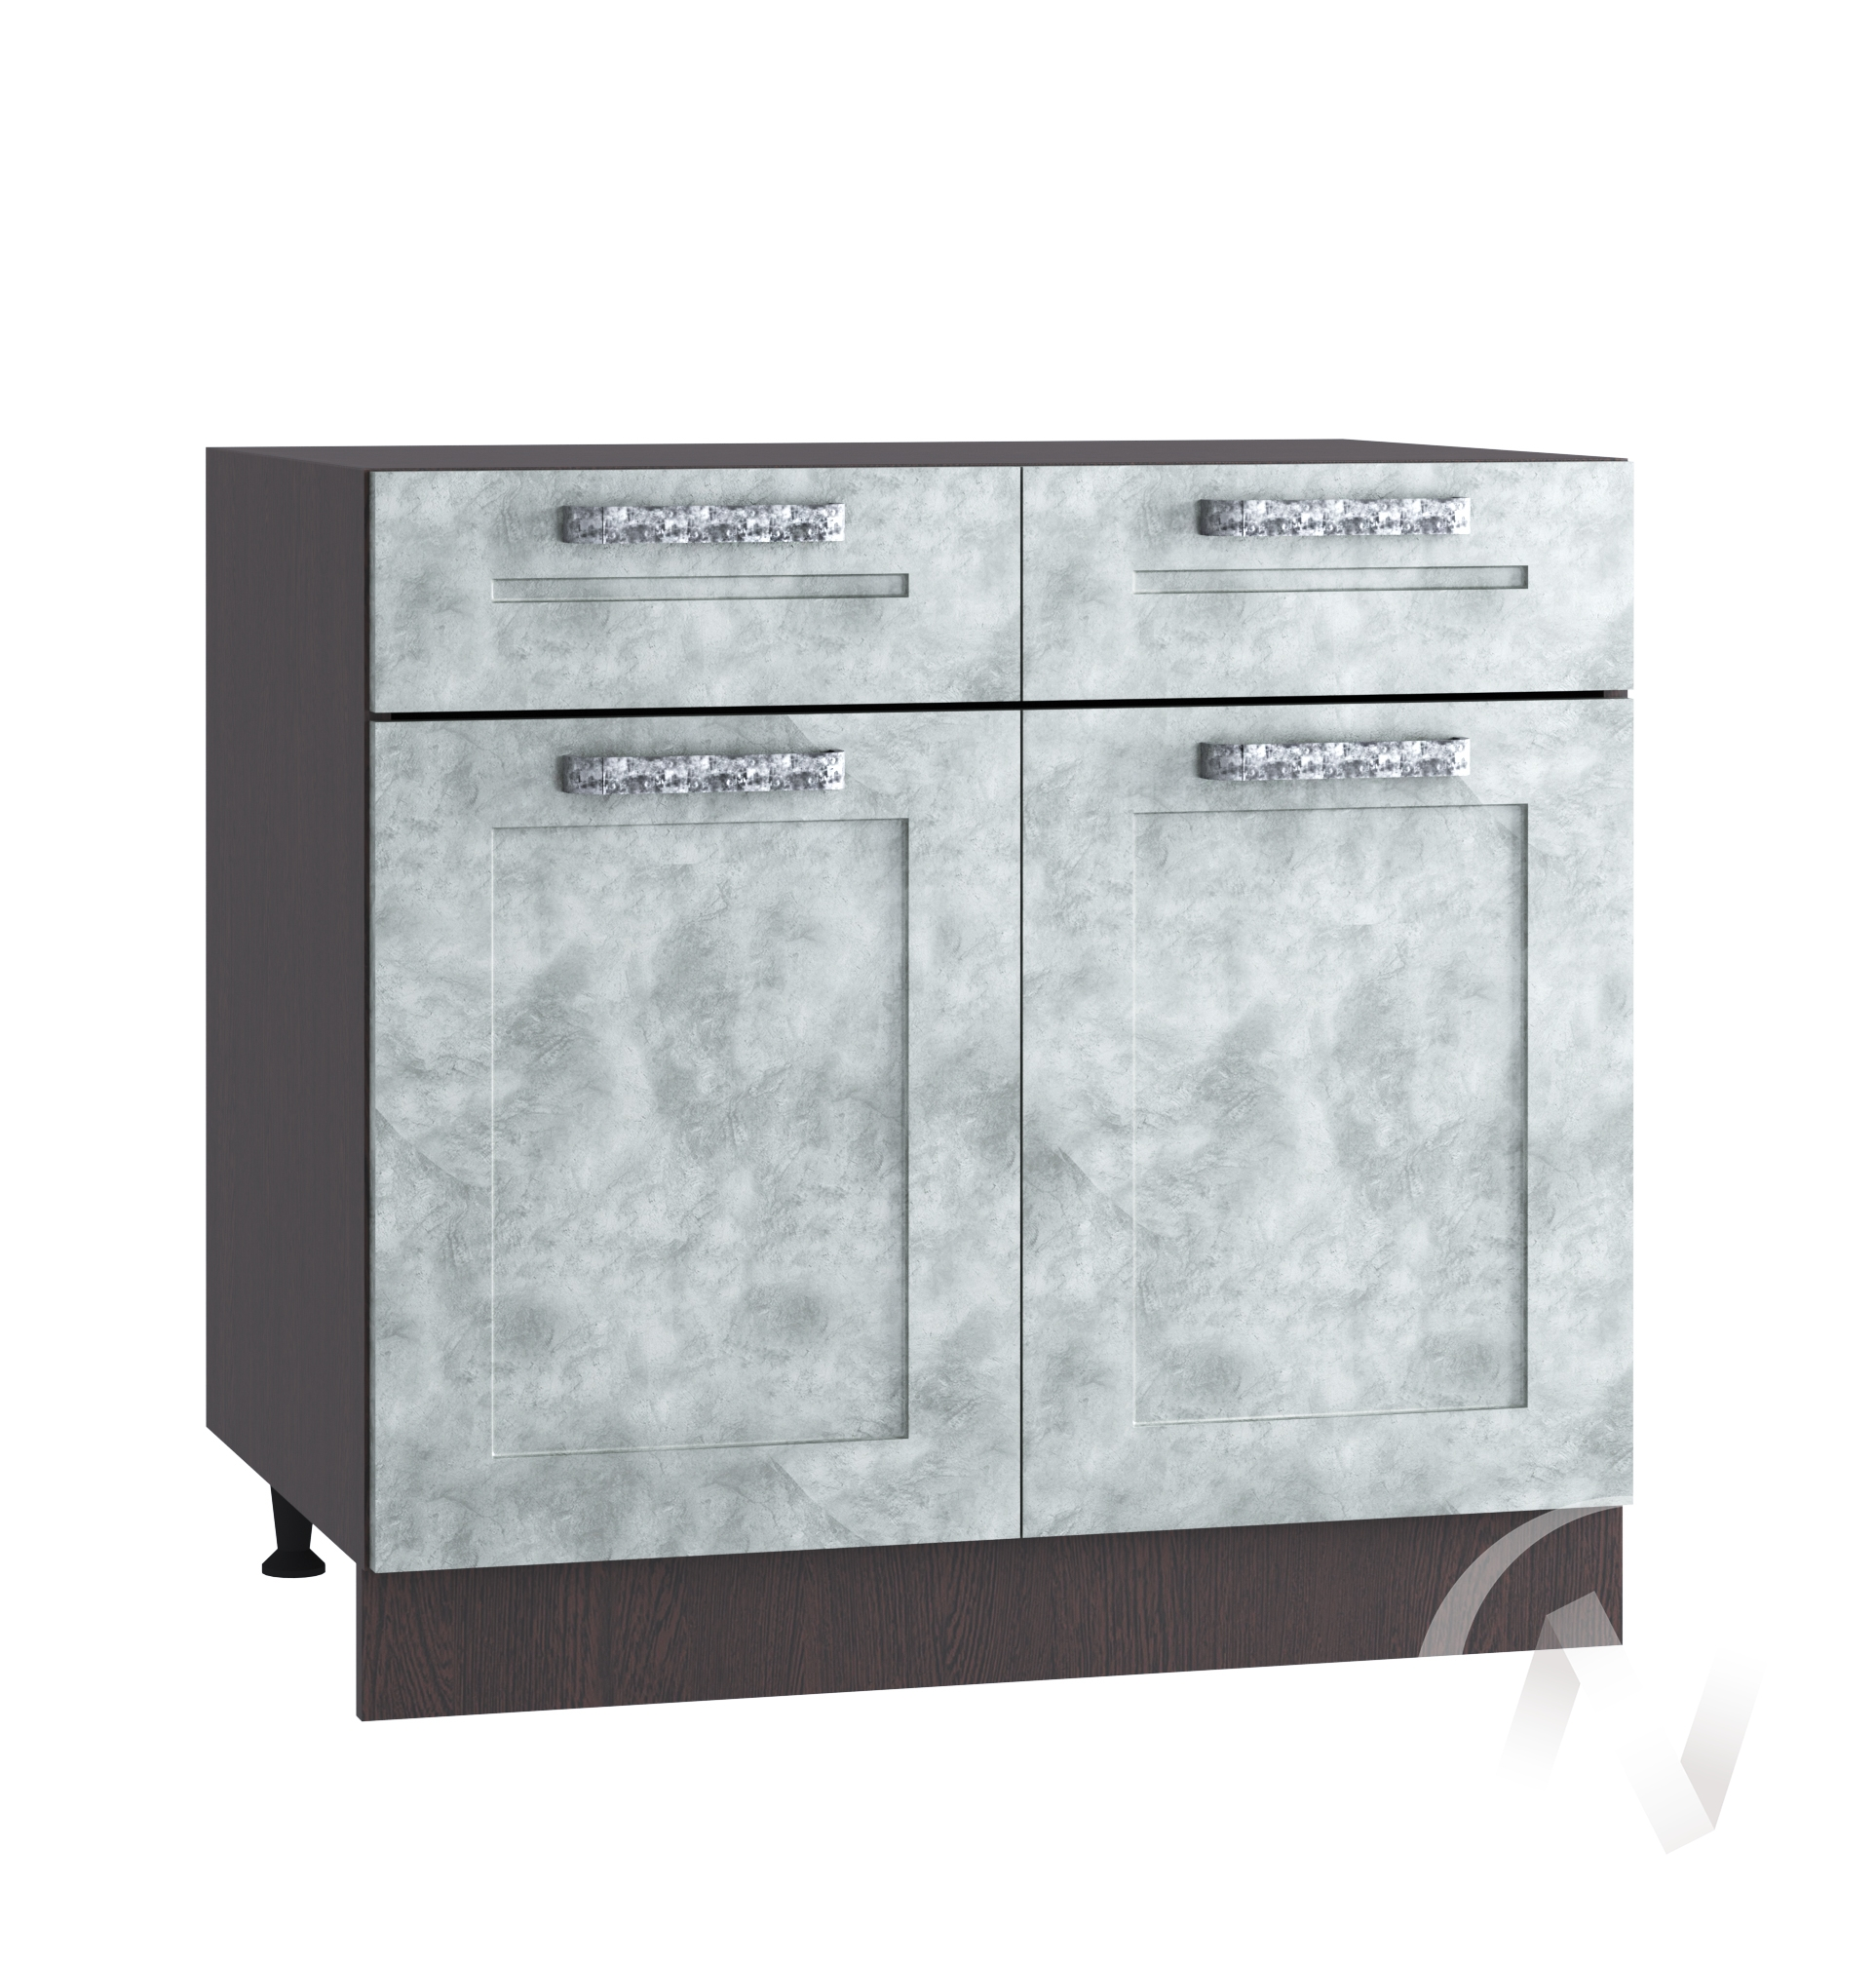 "Кухня ""Лофт"": Шкаф нижний с ящиками 800, ШН1Я 800 (Бетон серый/корпус венге)"